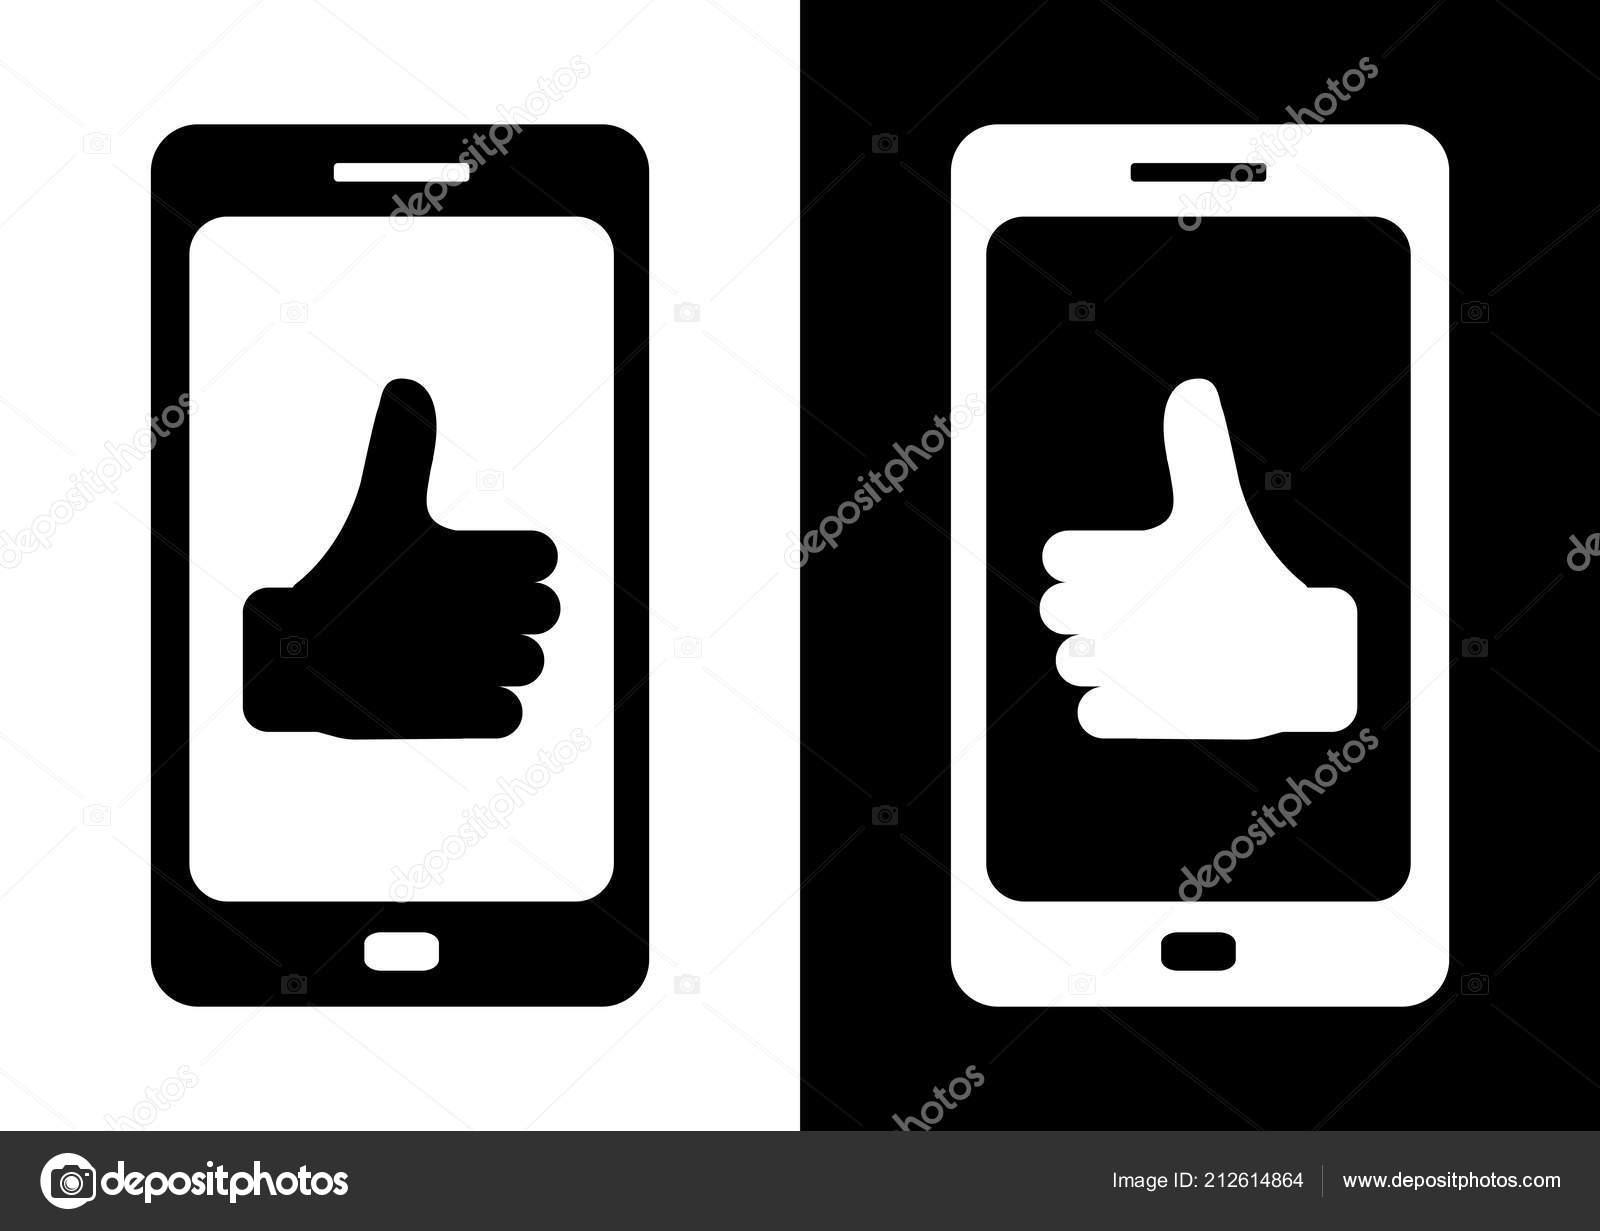 Illustrazione Sfondi Telefono Bianco Telefono Nero Sfondo Bianco